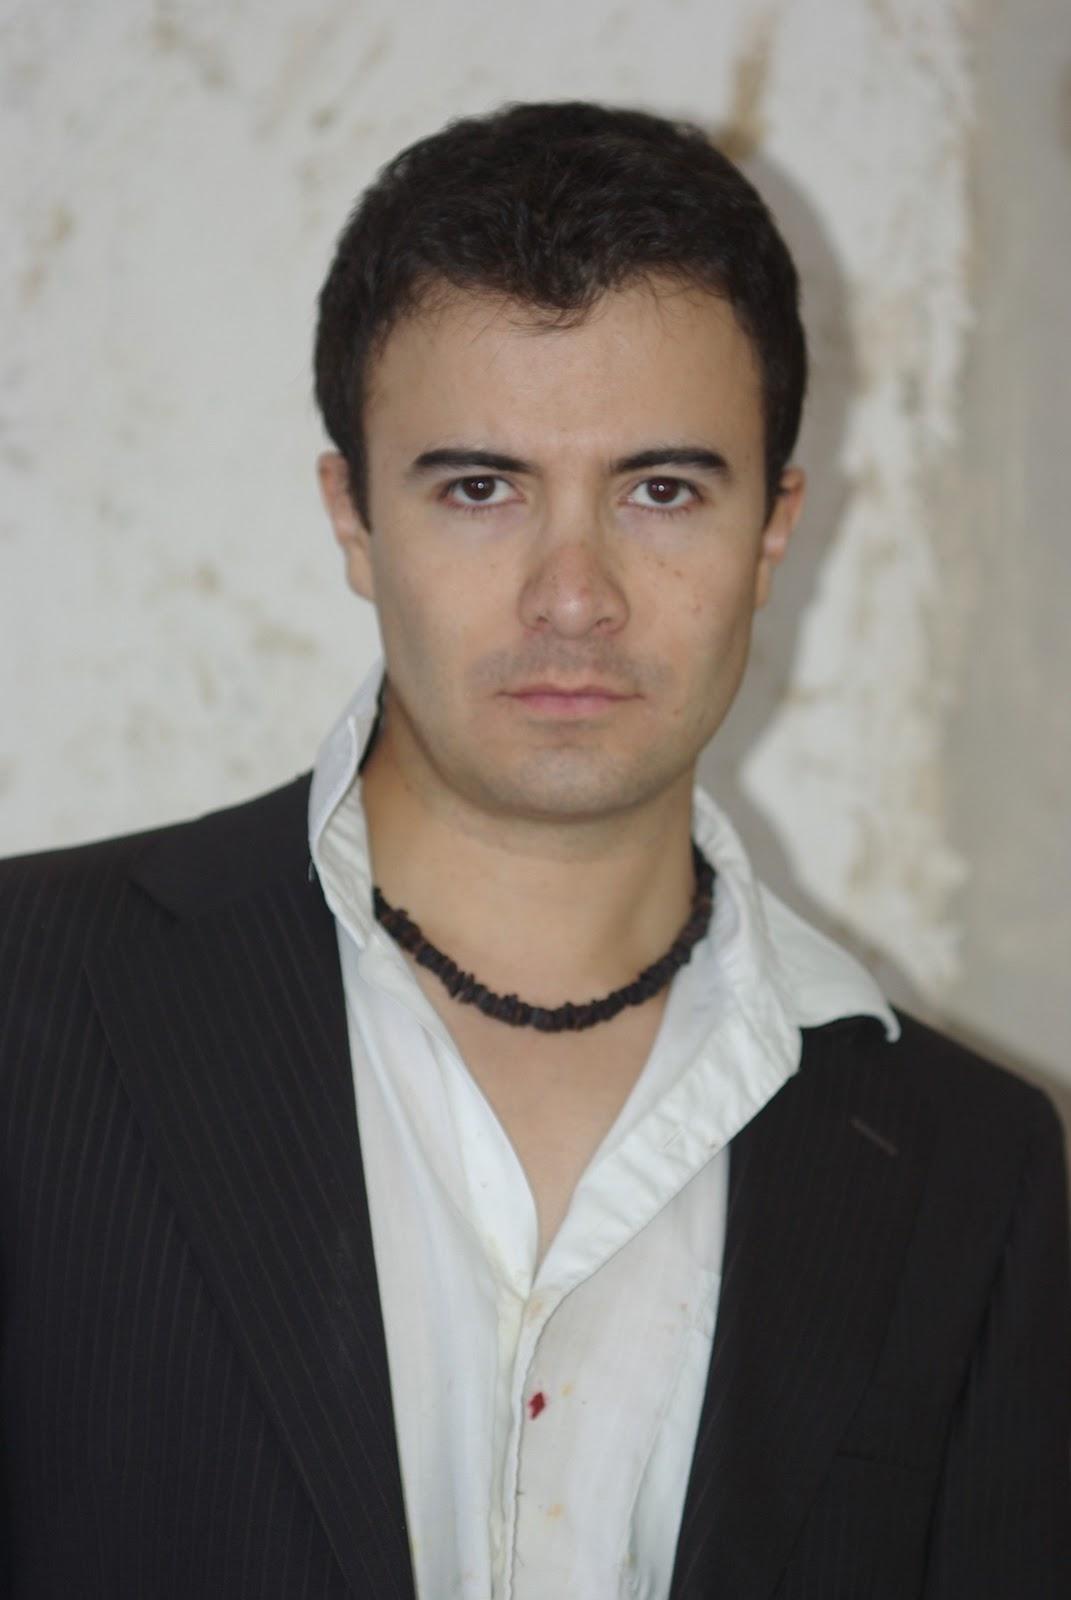 José Parra guadalajara Mexico 1975